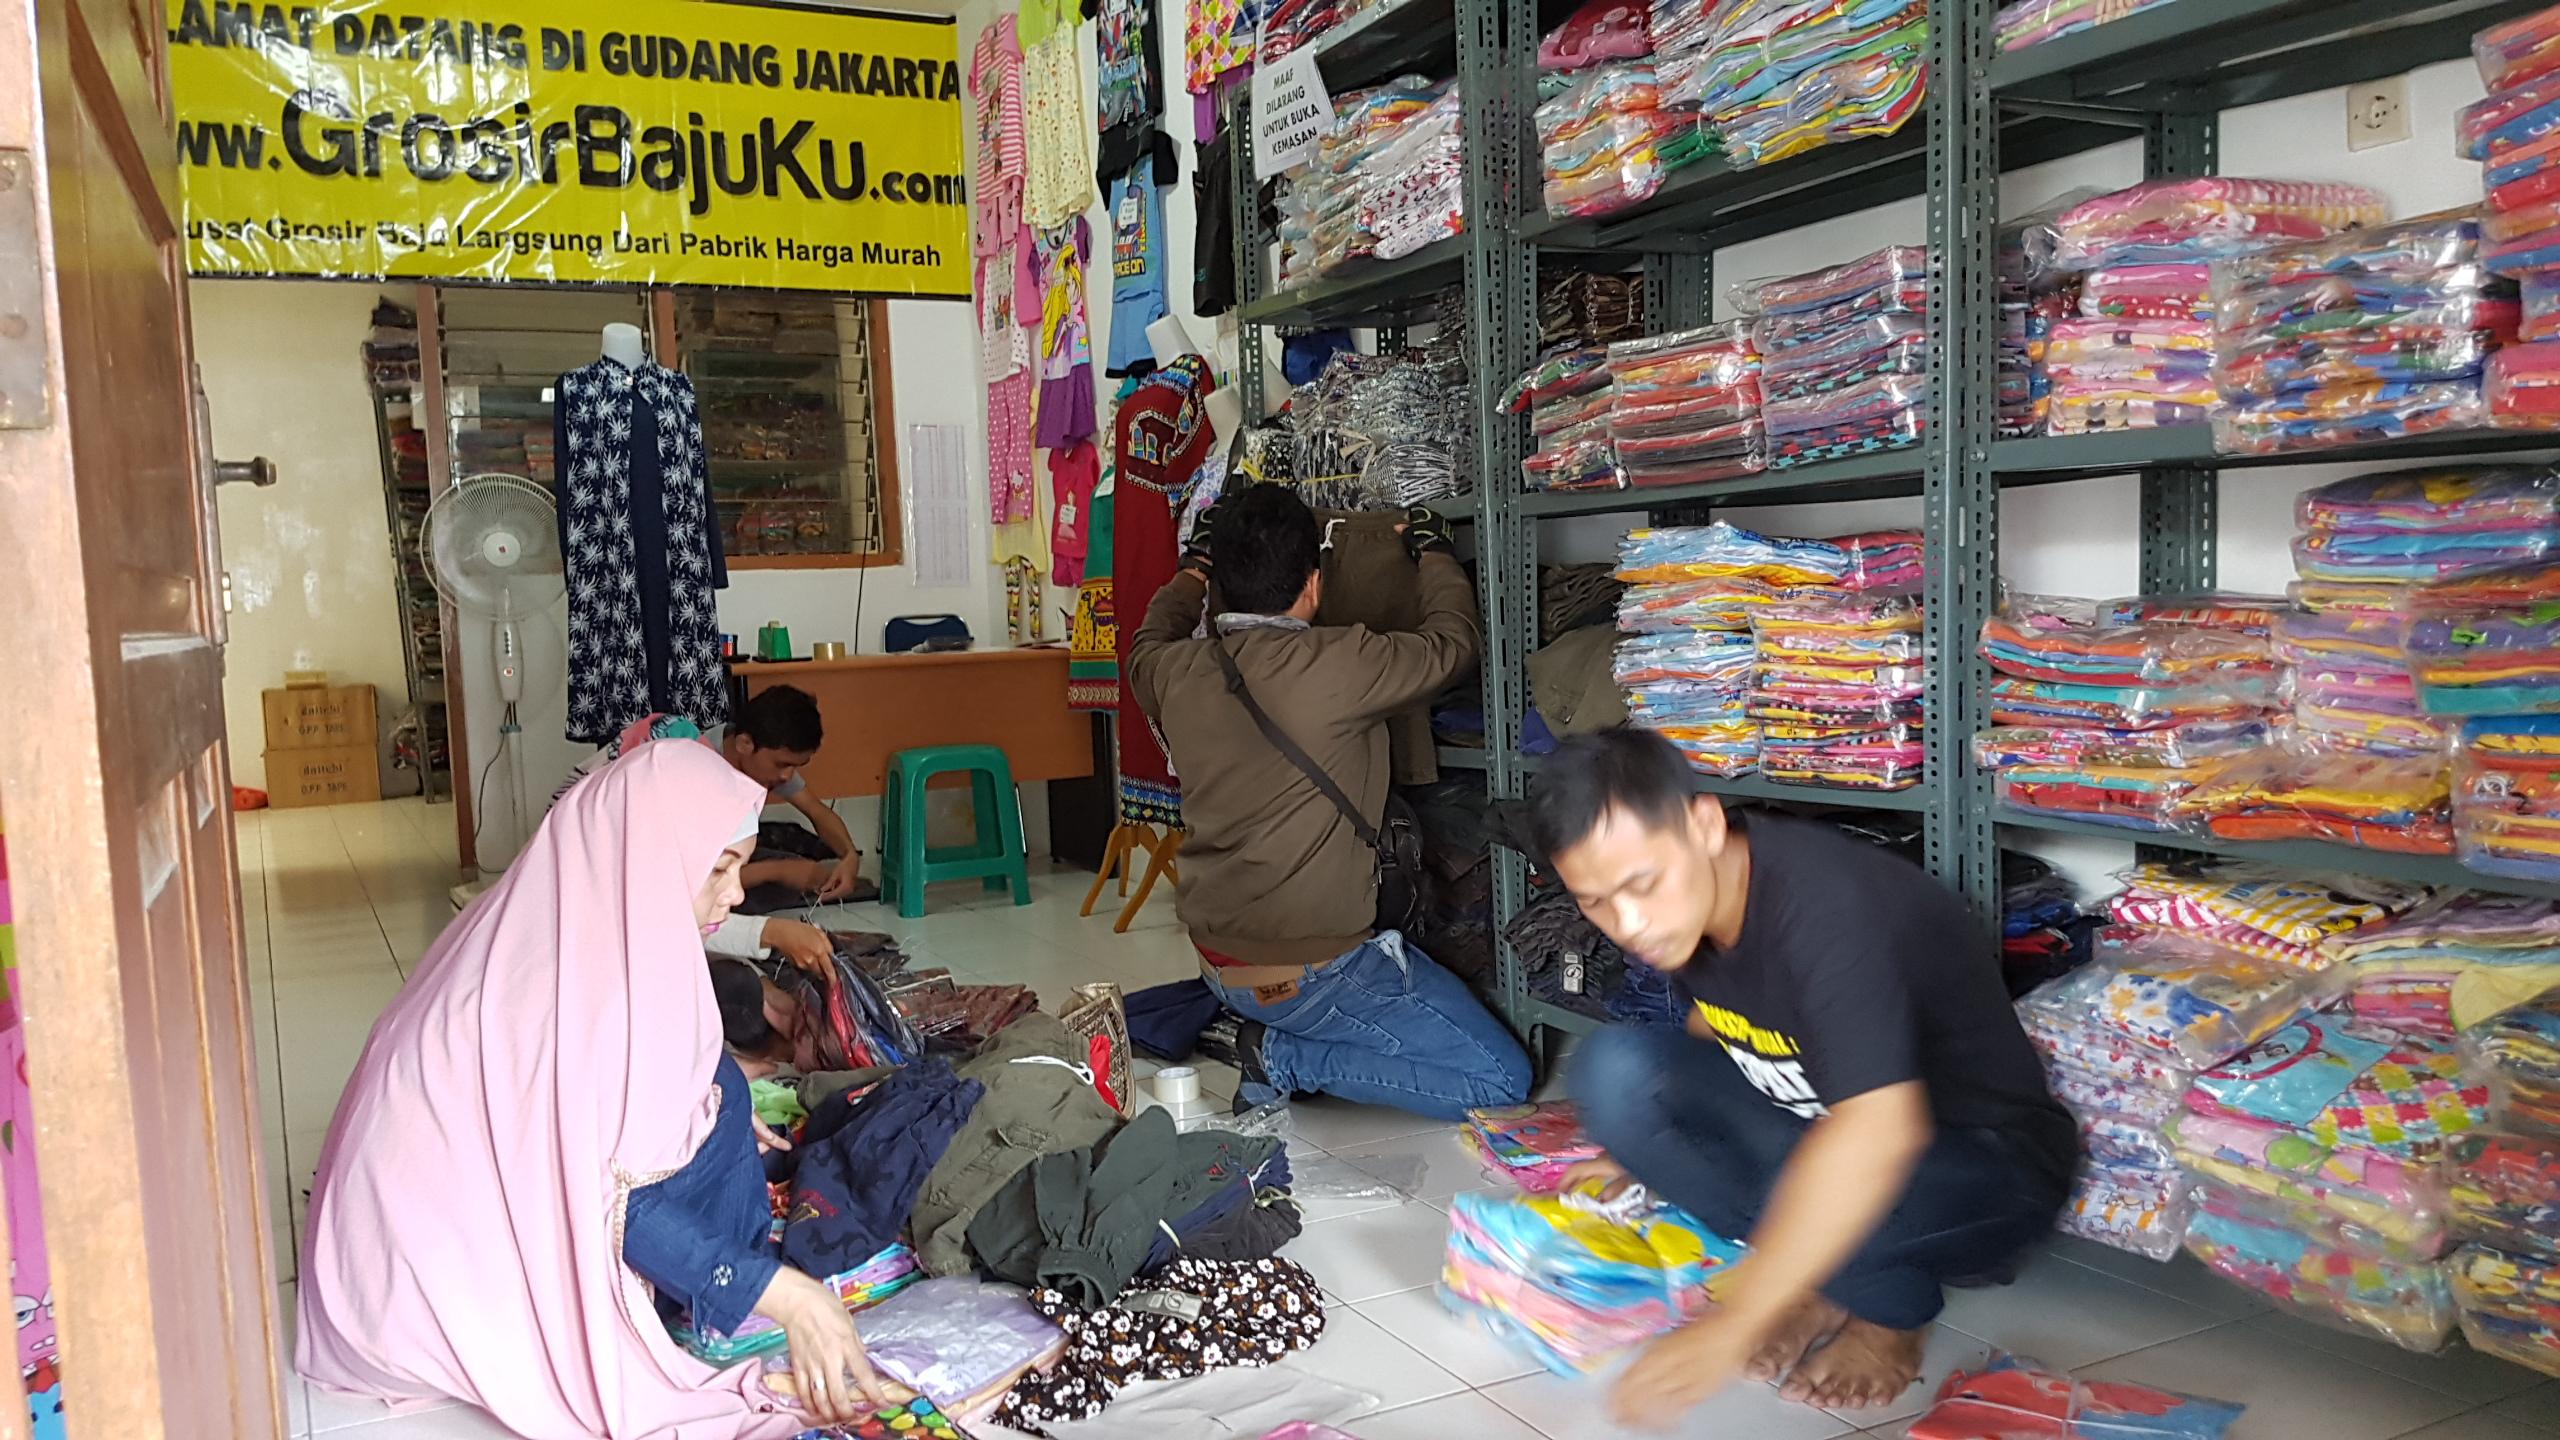 Pusat Obral Grosir Baju Anak 5000 Mukena Katun Jepang Murah Meriah Langsung Dari Pabrik Pusat Kaos Muslim Dewasa Rp28,000